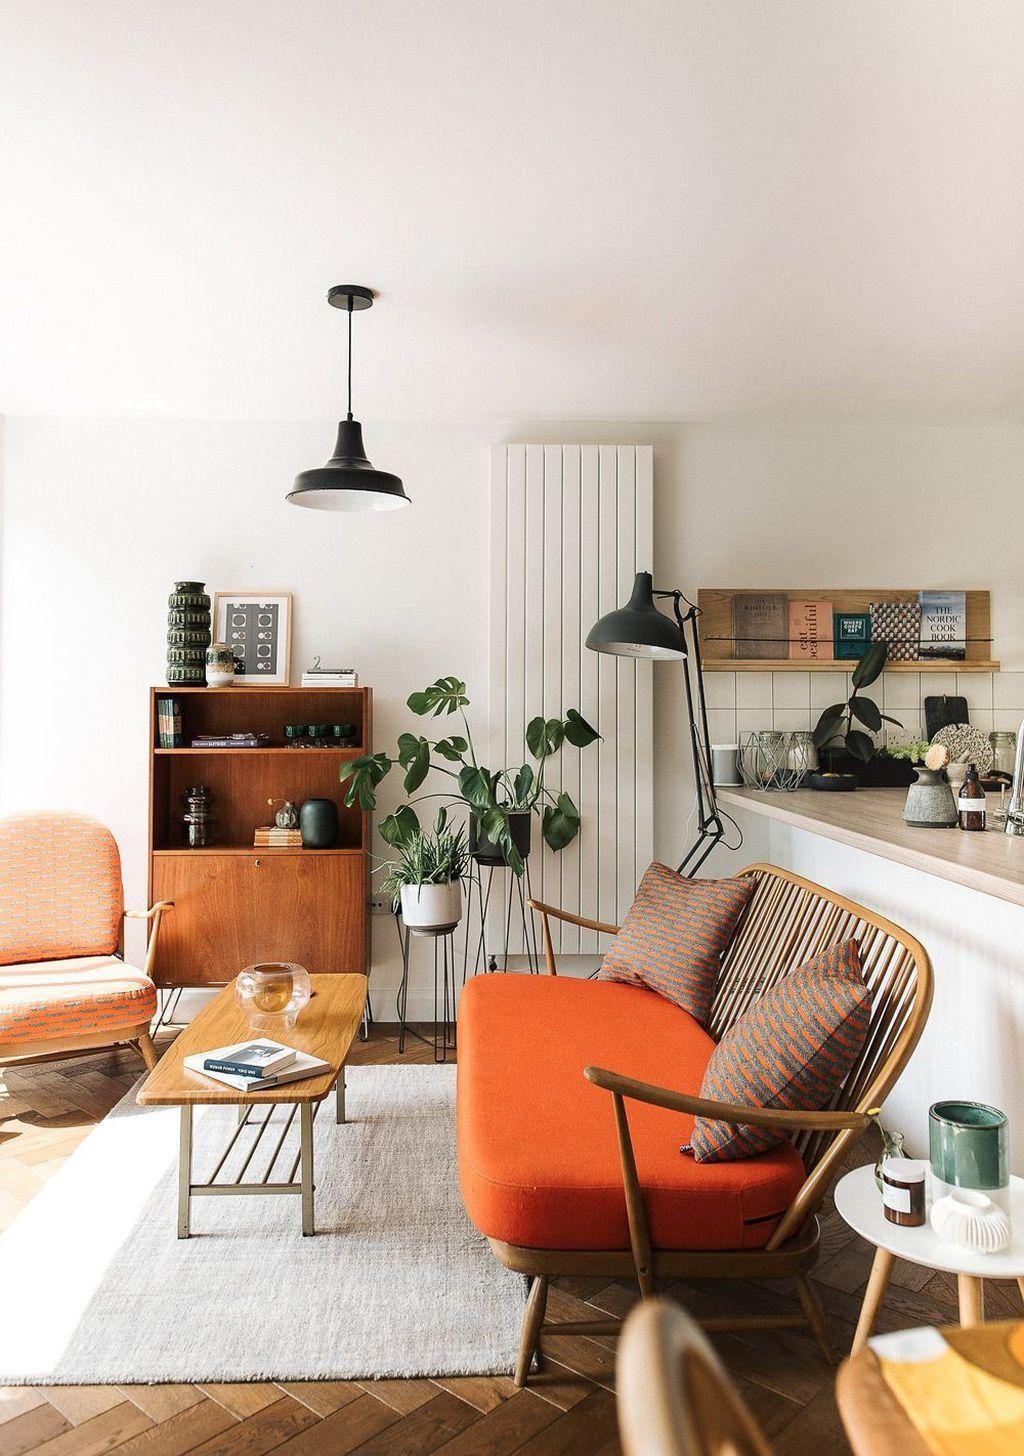 47 Amazing Mid Century Modern Home Decor Desain Interior Ide Dekorasi Rumah Dekorasi Rumah Elegan